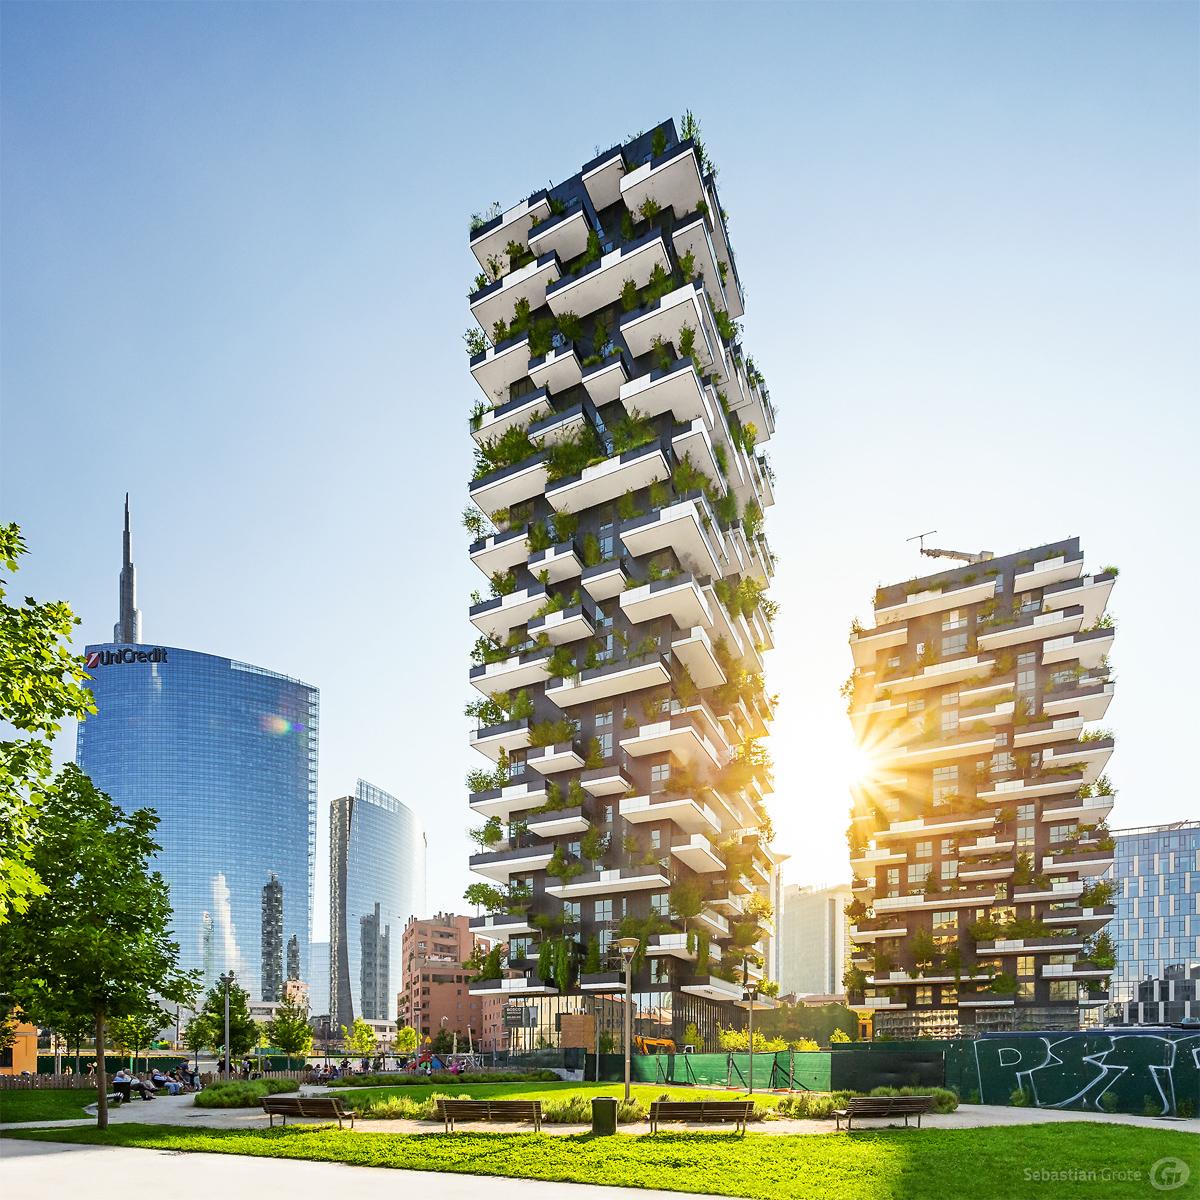 Bosco verticale milano on behance for Garden designer milano